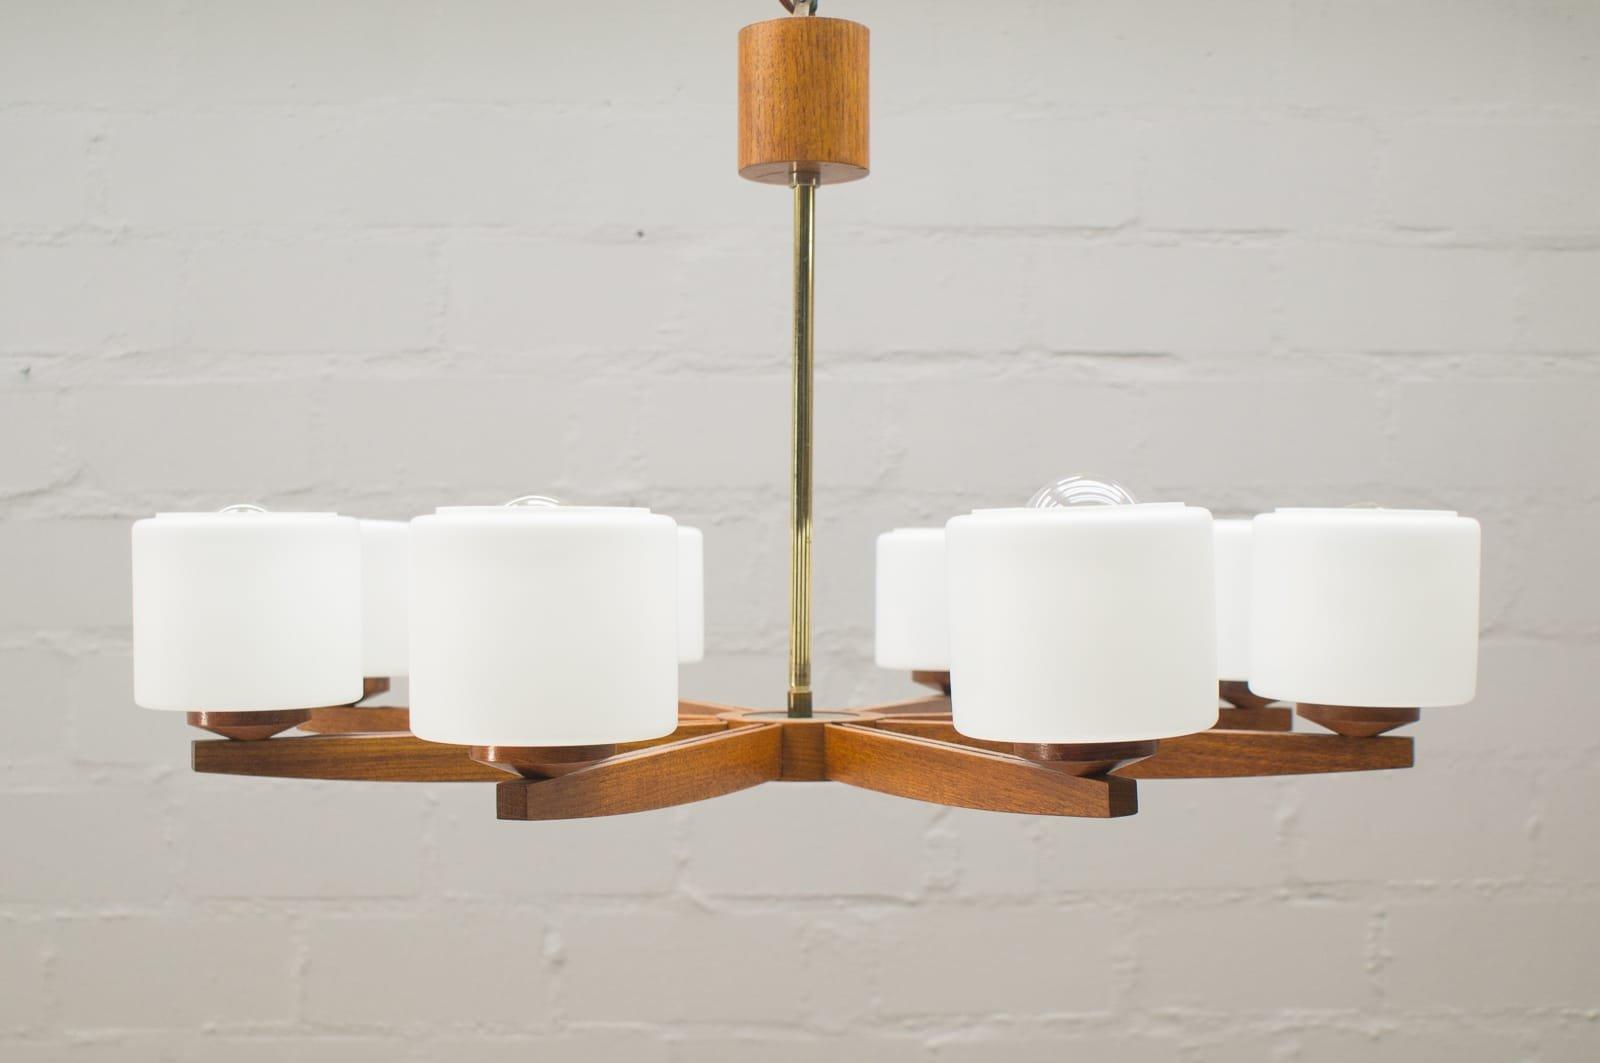 Vintage scandinavian teak lamp with eight opaline glass shades for vintage scandinavian teak lamp with eight opaline glass shades for sale at pamono arubaitofo Images